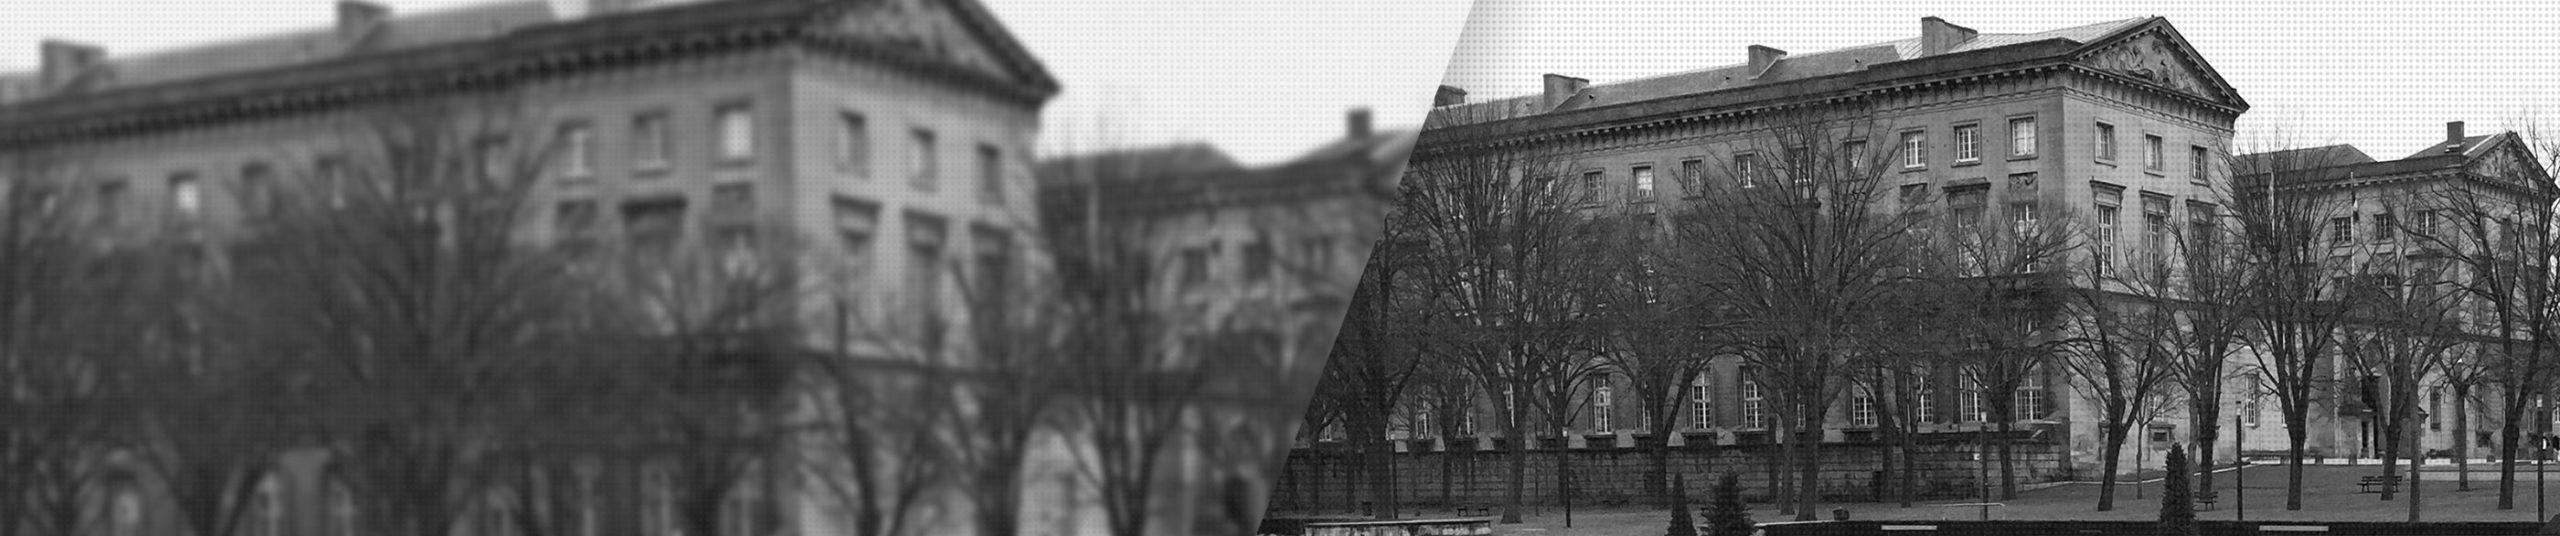 Palais de Justice de Metz